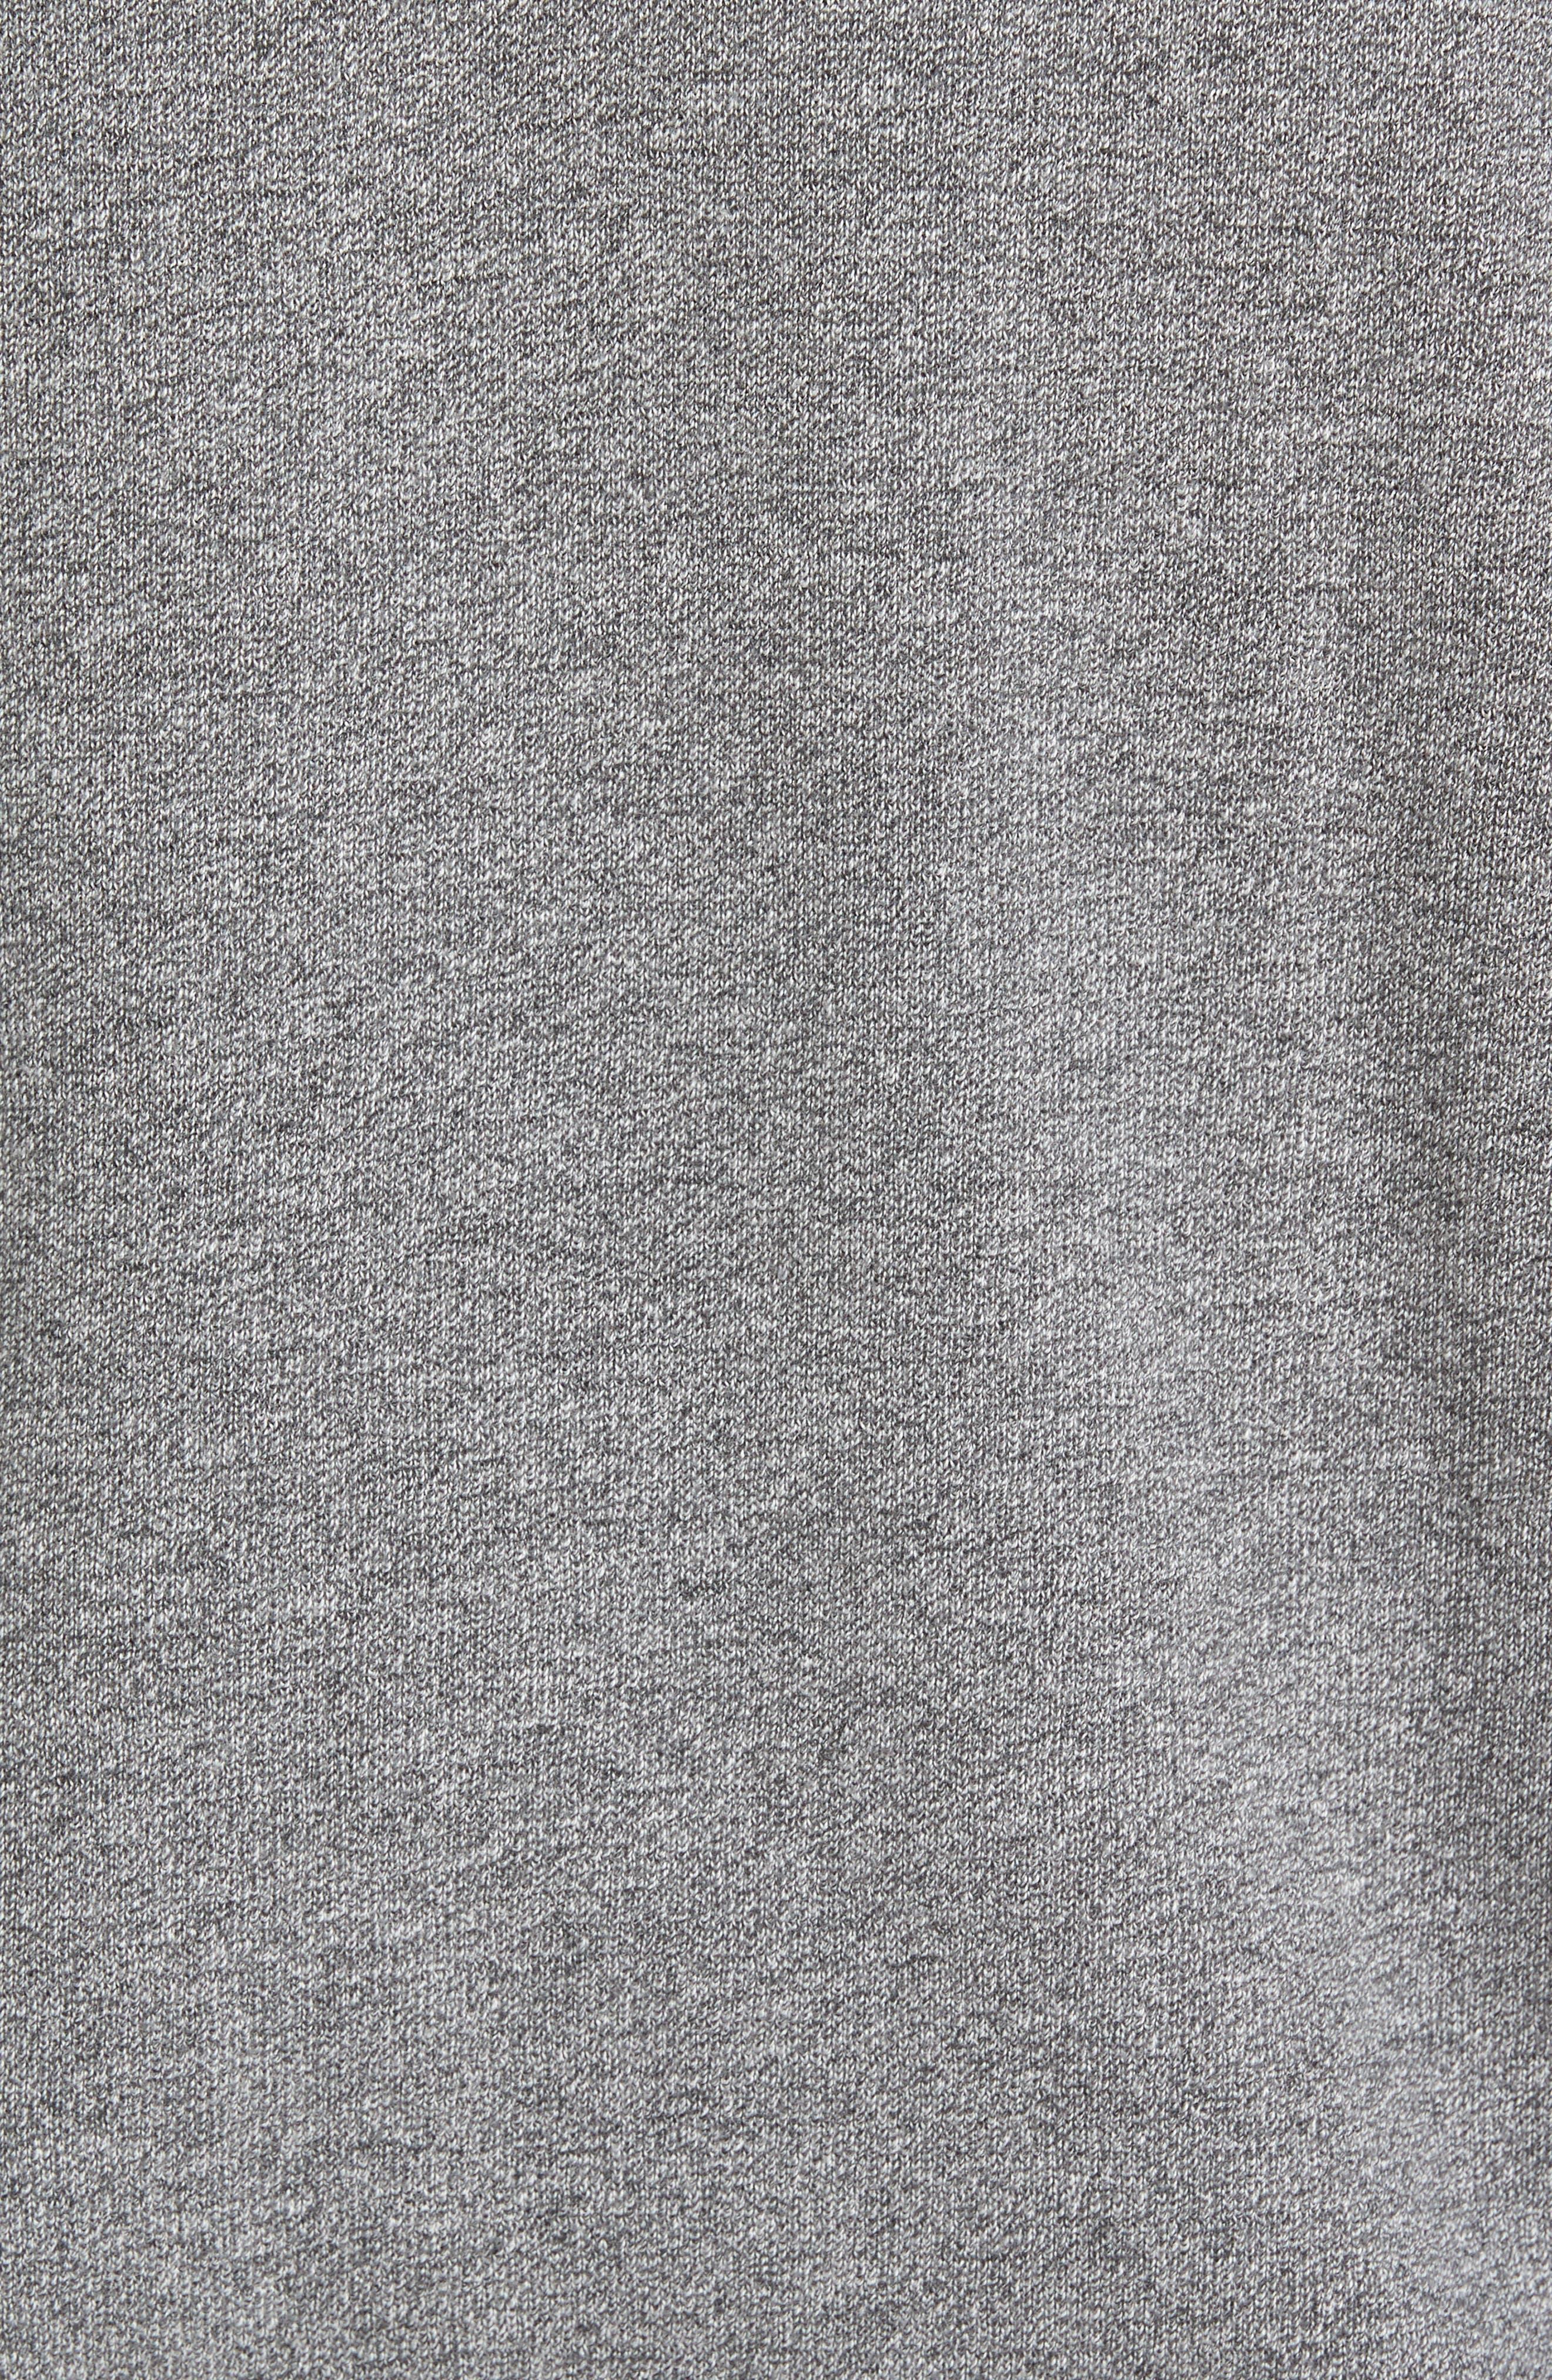 NFL Stitch of Liberty Embroidered Crewneck Sweatshirt,                             Alternate thumbnail 134, color,